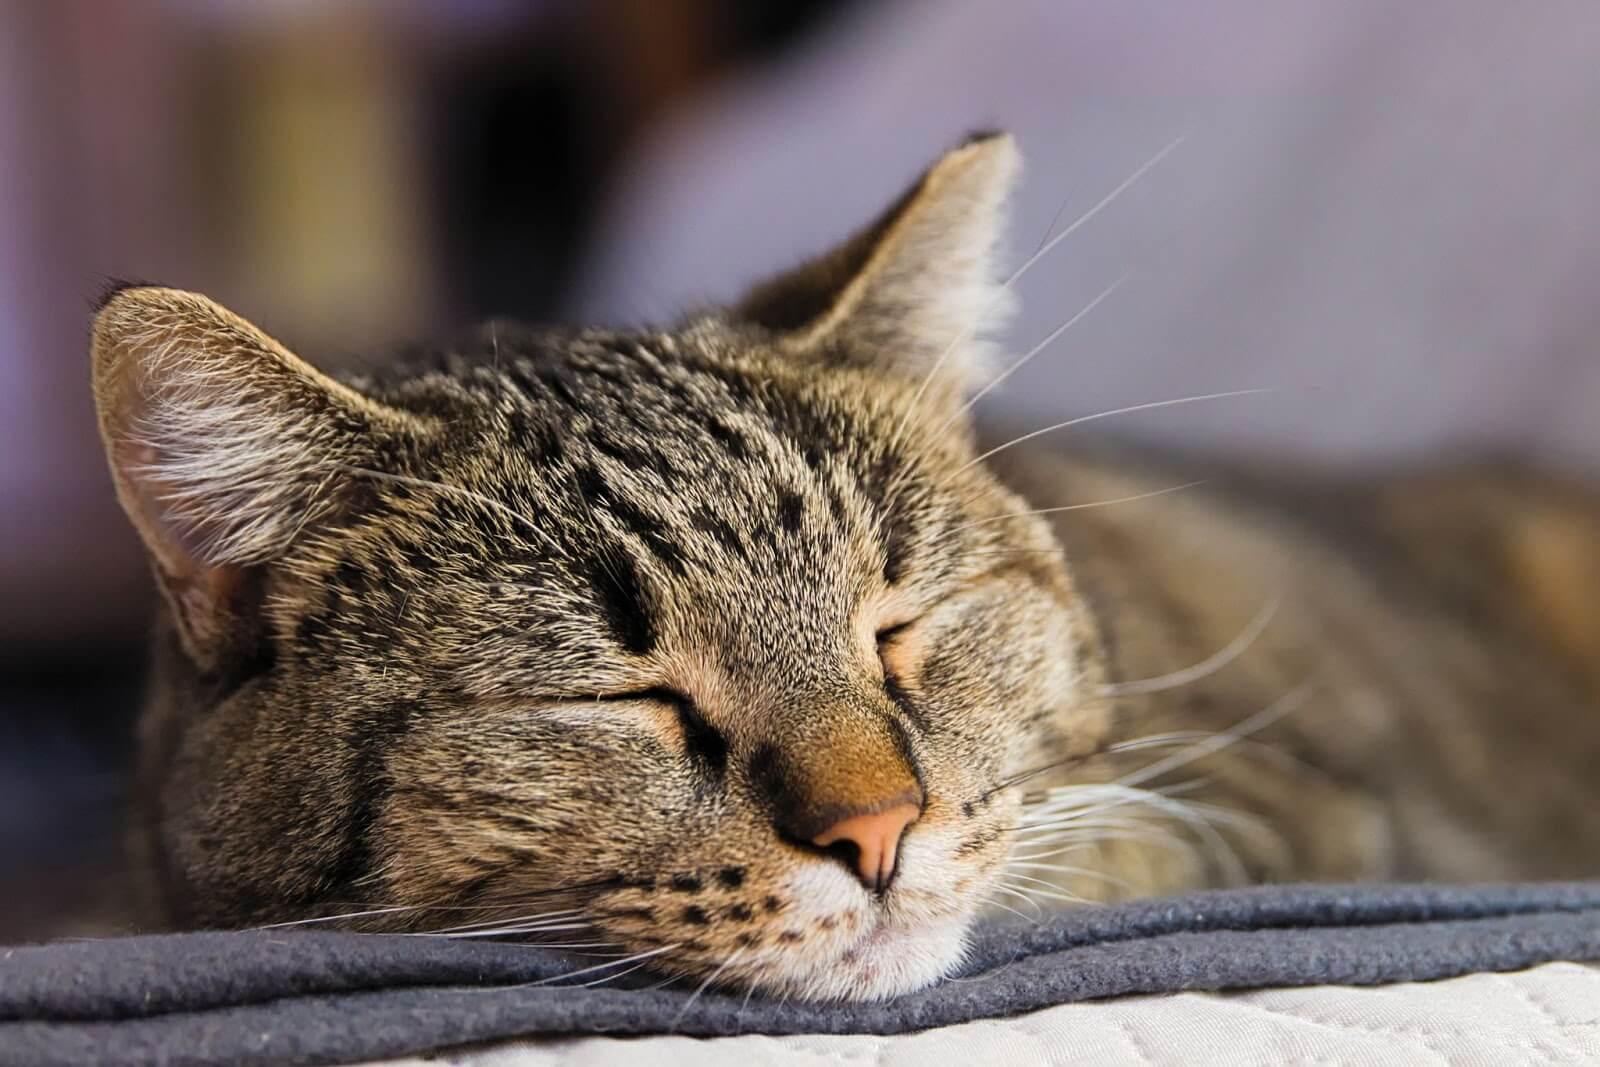 cats love sleeping